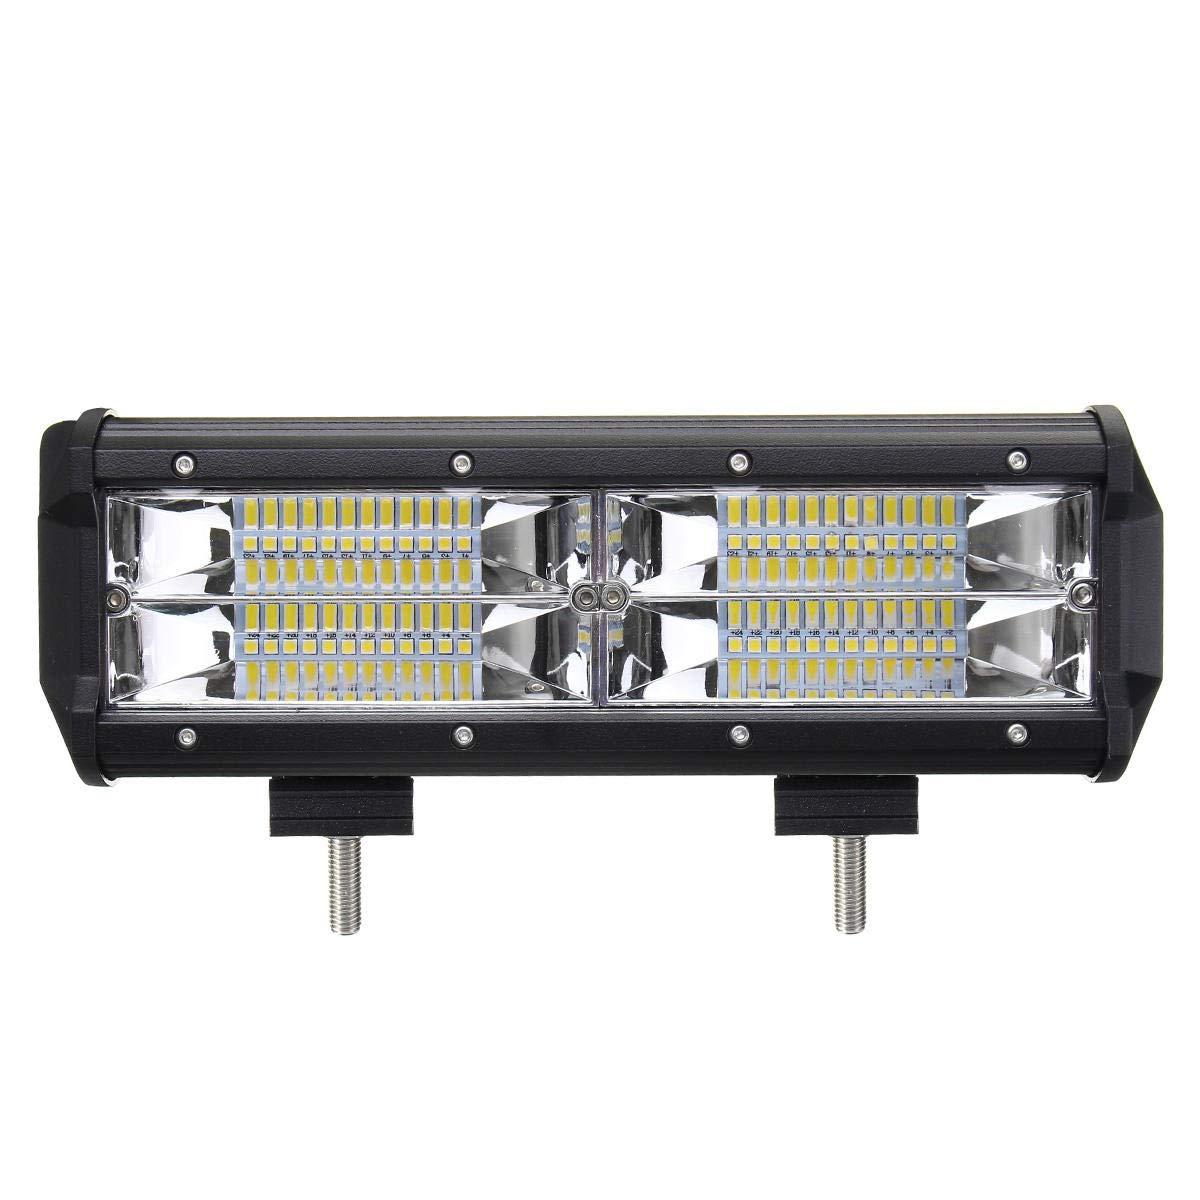 Amazon com: 9Inch 144W 8D LED Work Light Bars Flood Spot Combo Beam